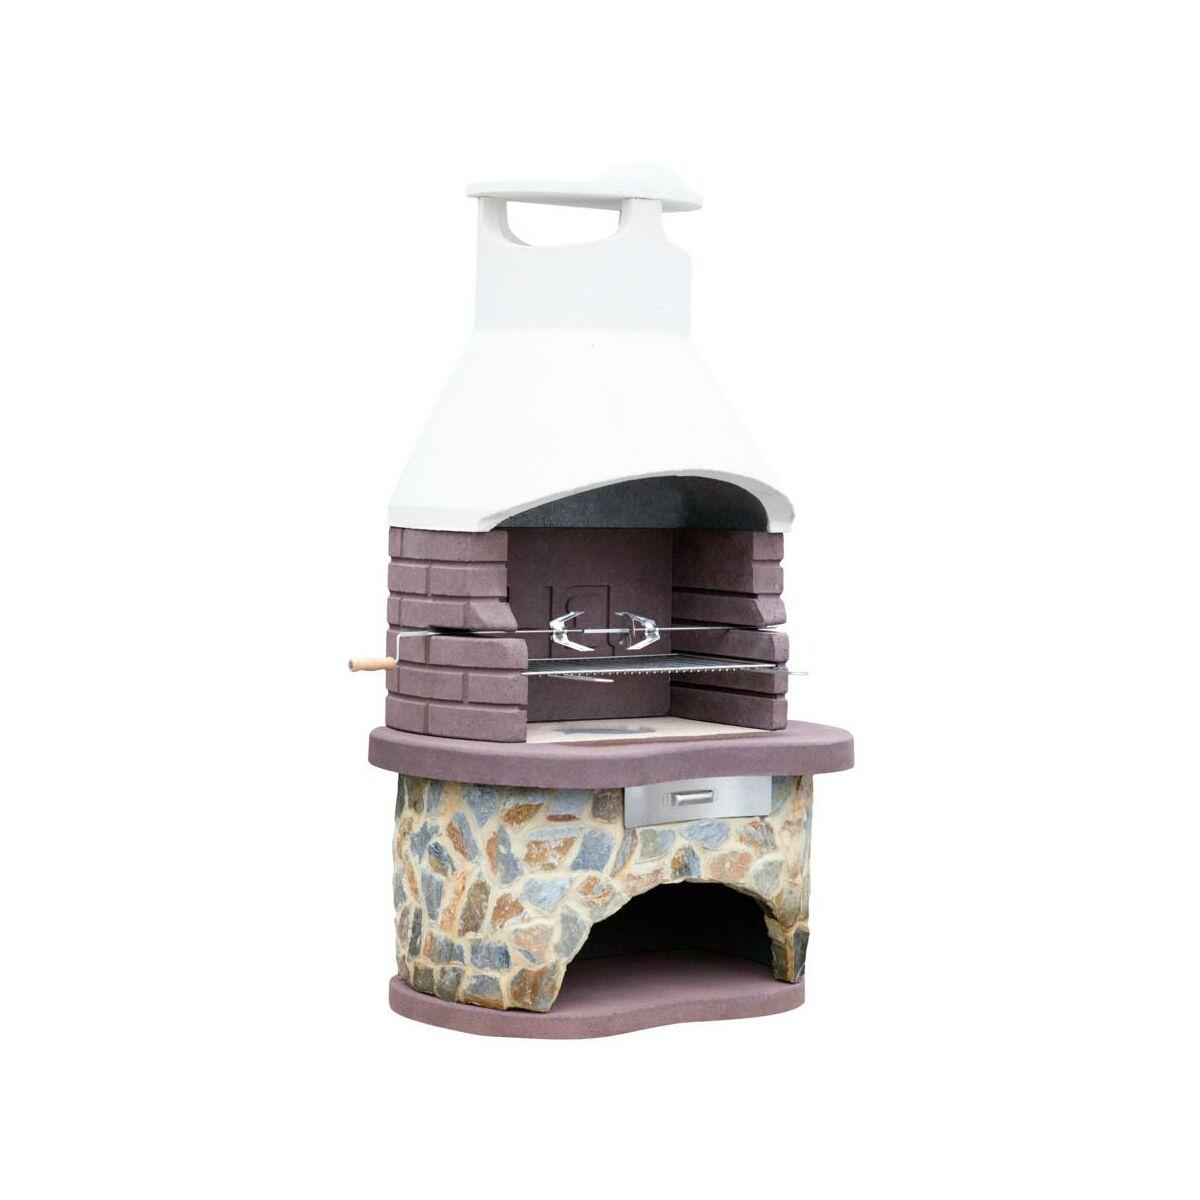 grill betonowy tampere b k grille betonowe w atrakcyjnej cenie w sklepach leroy merlin. Black Bedroom Furniture Sets. Home Design Ideas